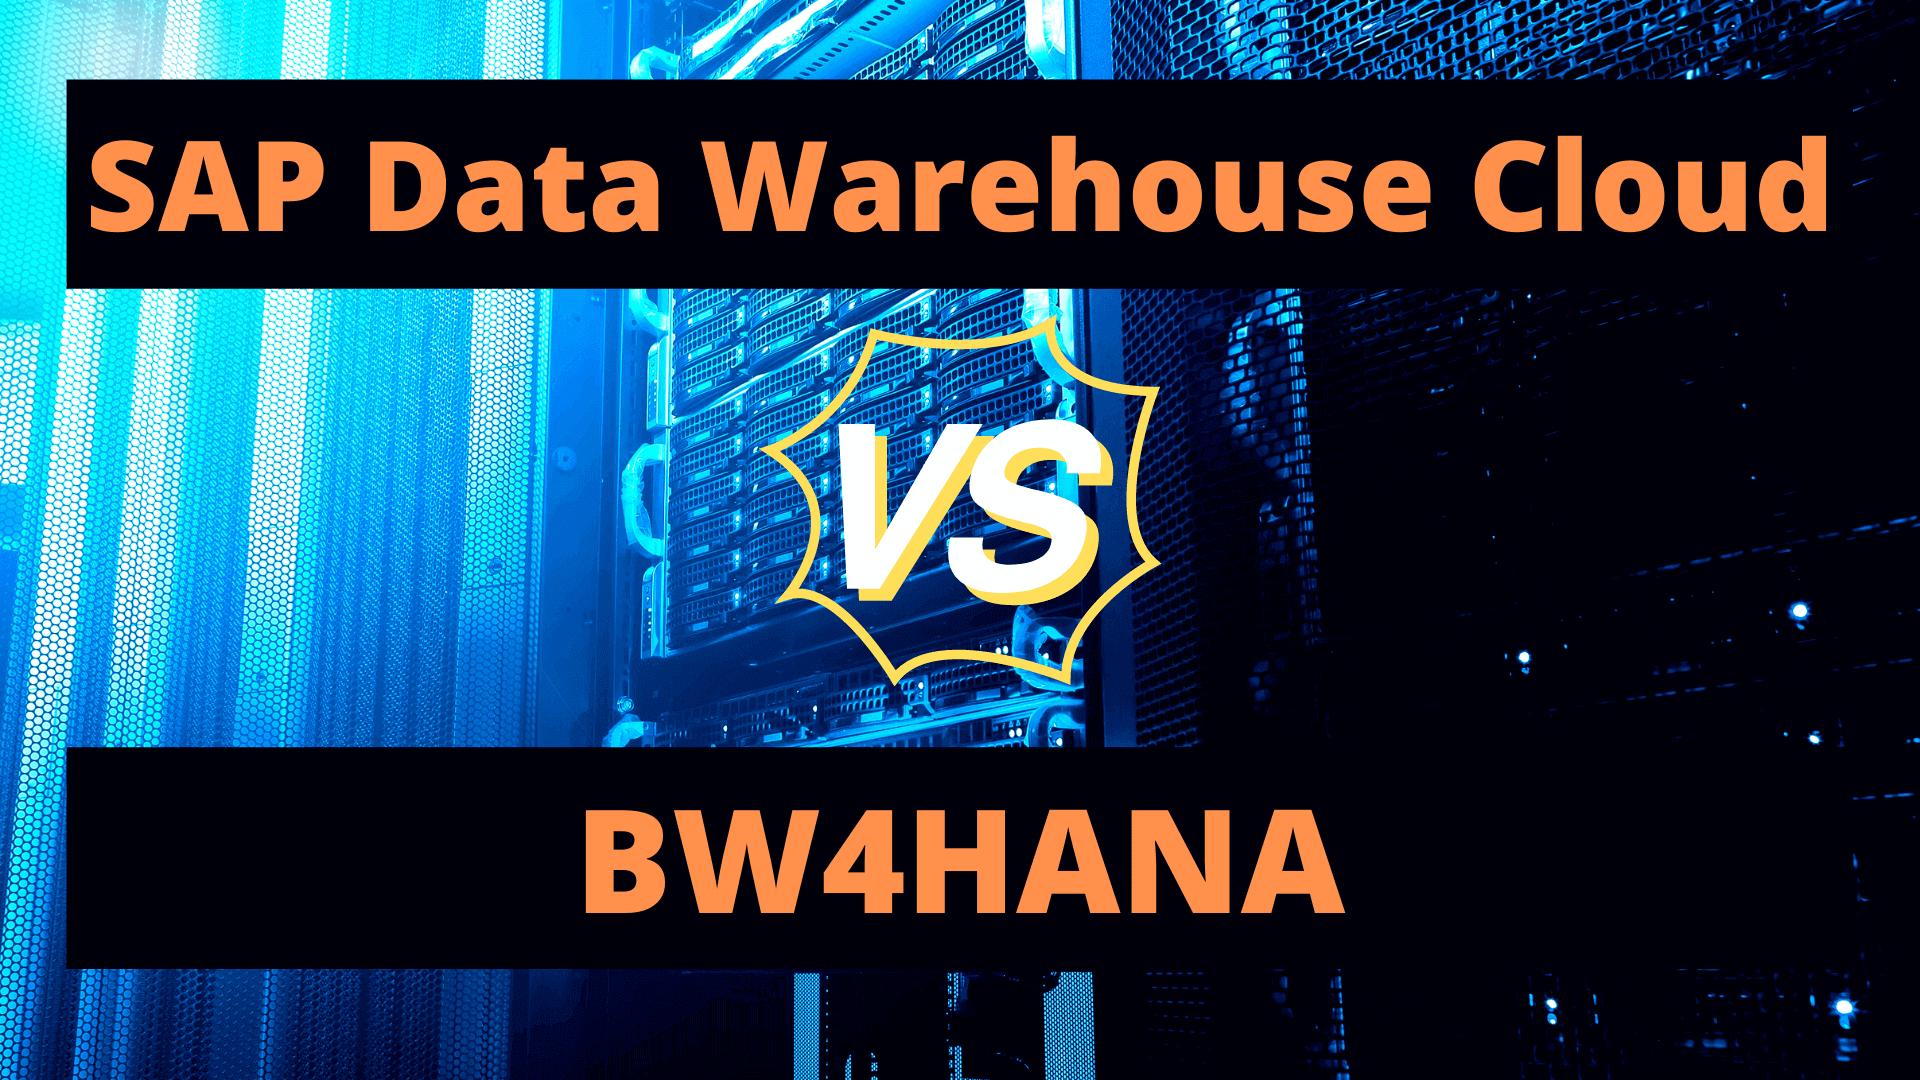 SAP Data Warehouse Cloud Vs BW4HANA